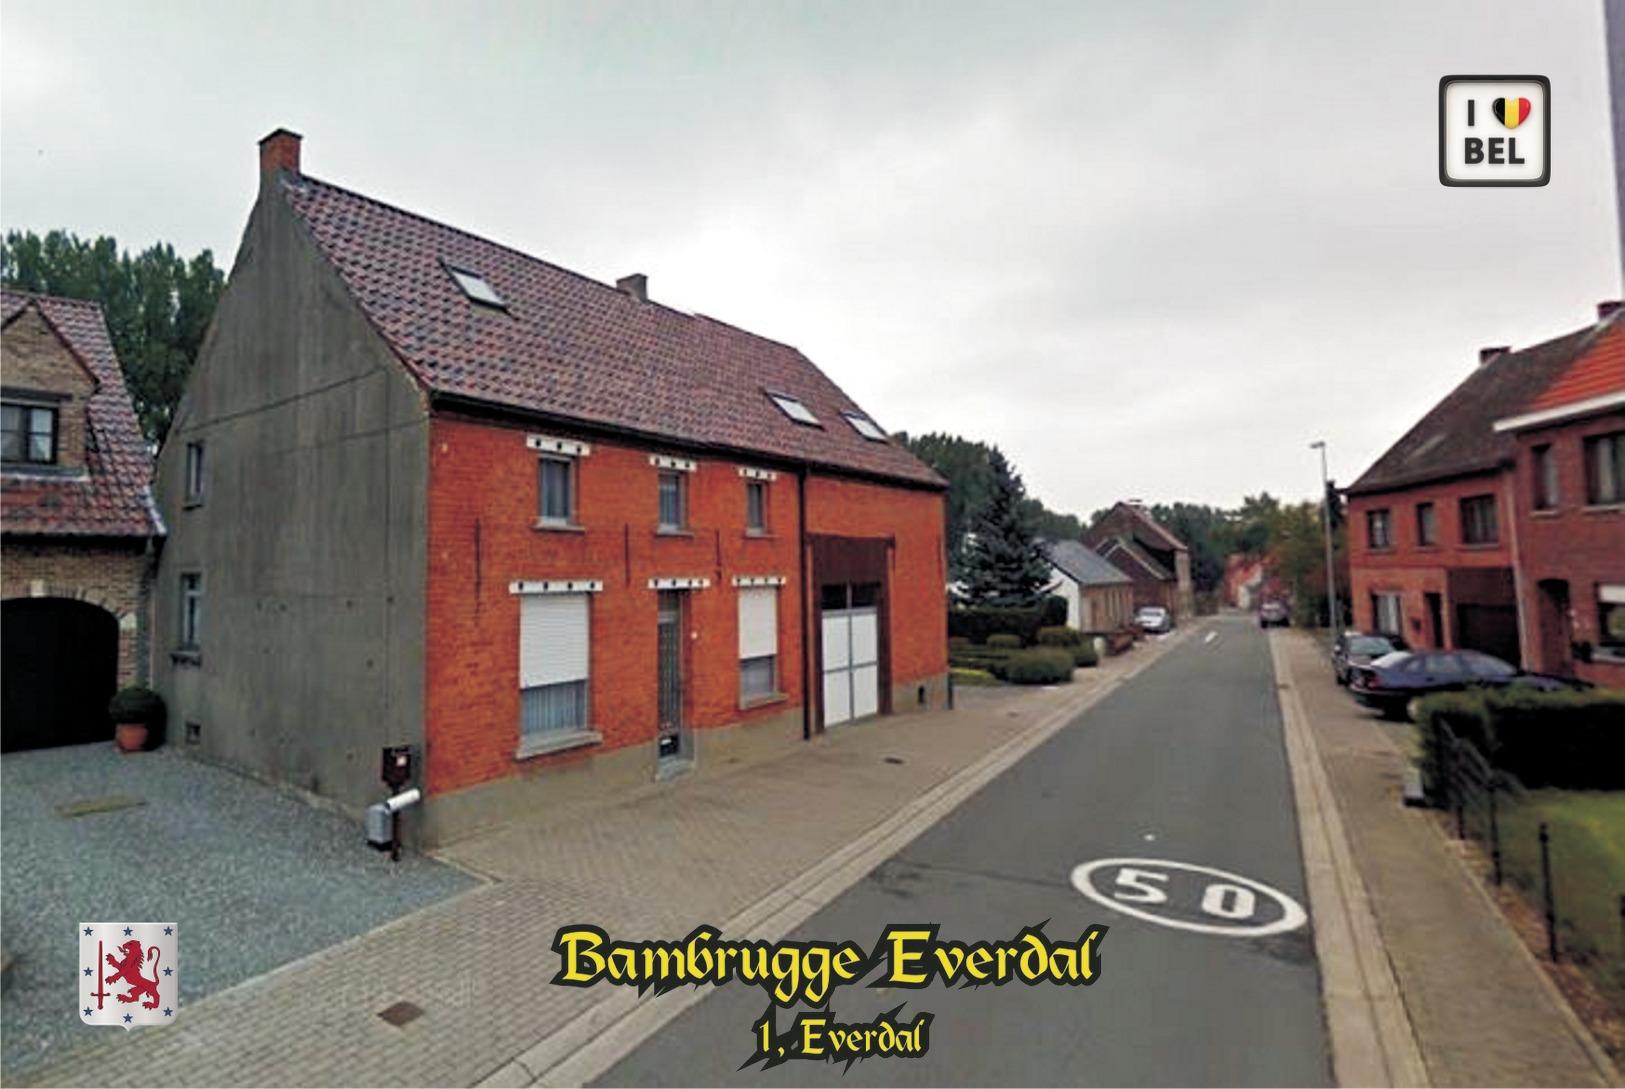 Set 8 Cartes Postales, Transport, Belgium, Bambrugge (Erpe-Mere) Bus Stations - Autobus & Pullman